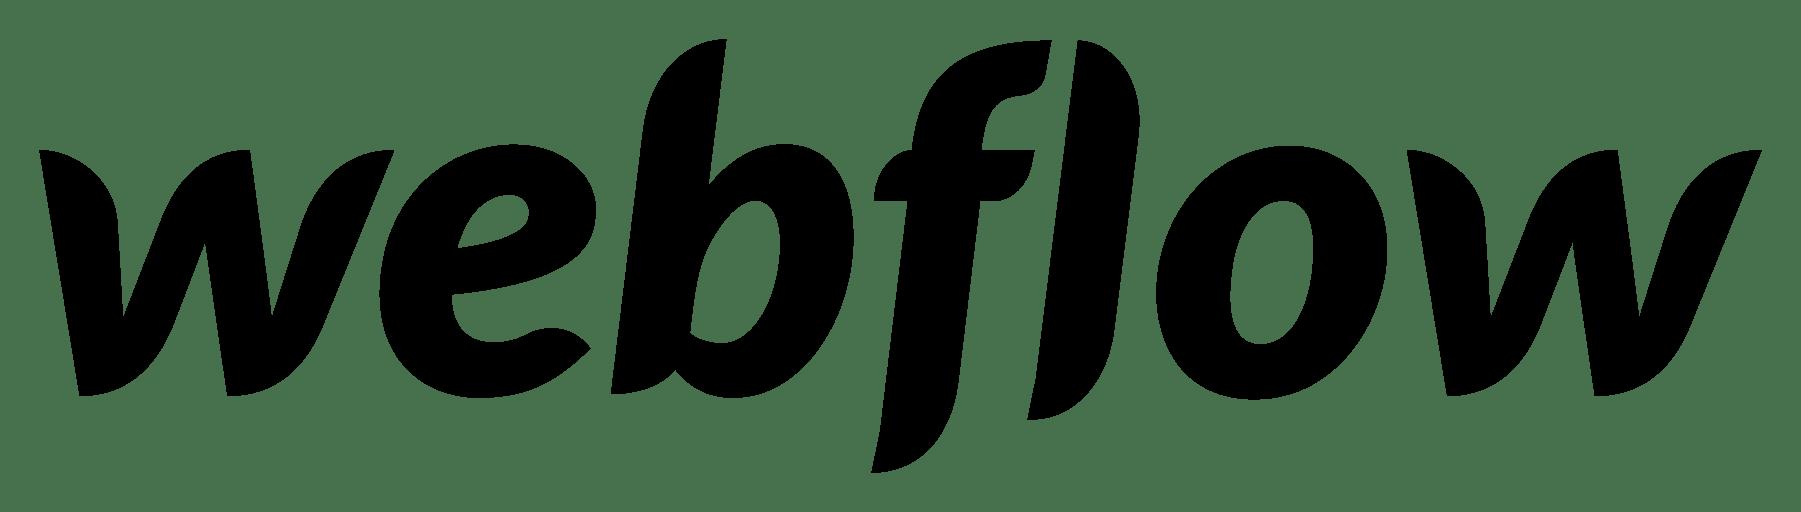 Webflow Webdesign Tool Logo schwarz